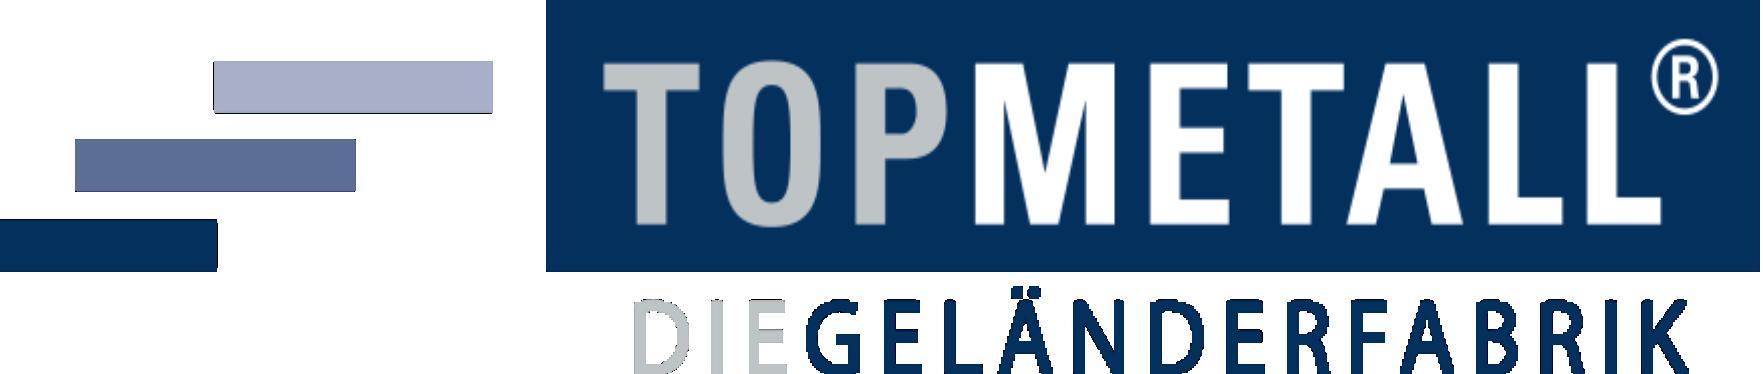 TOPMETALL